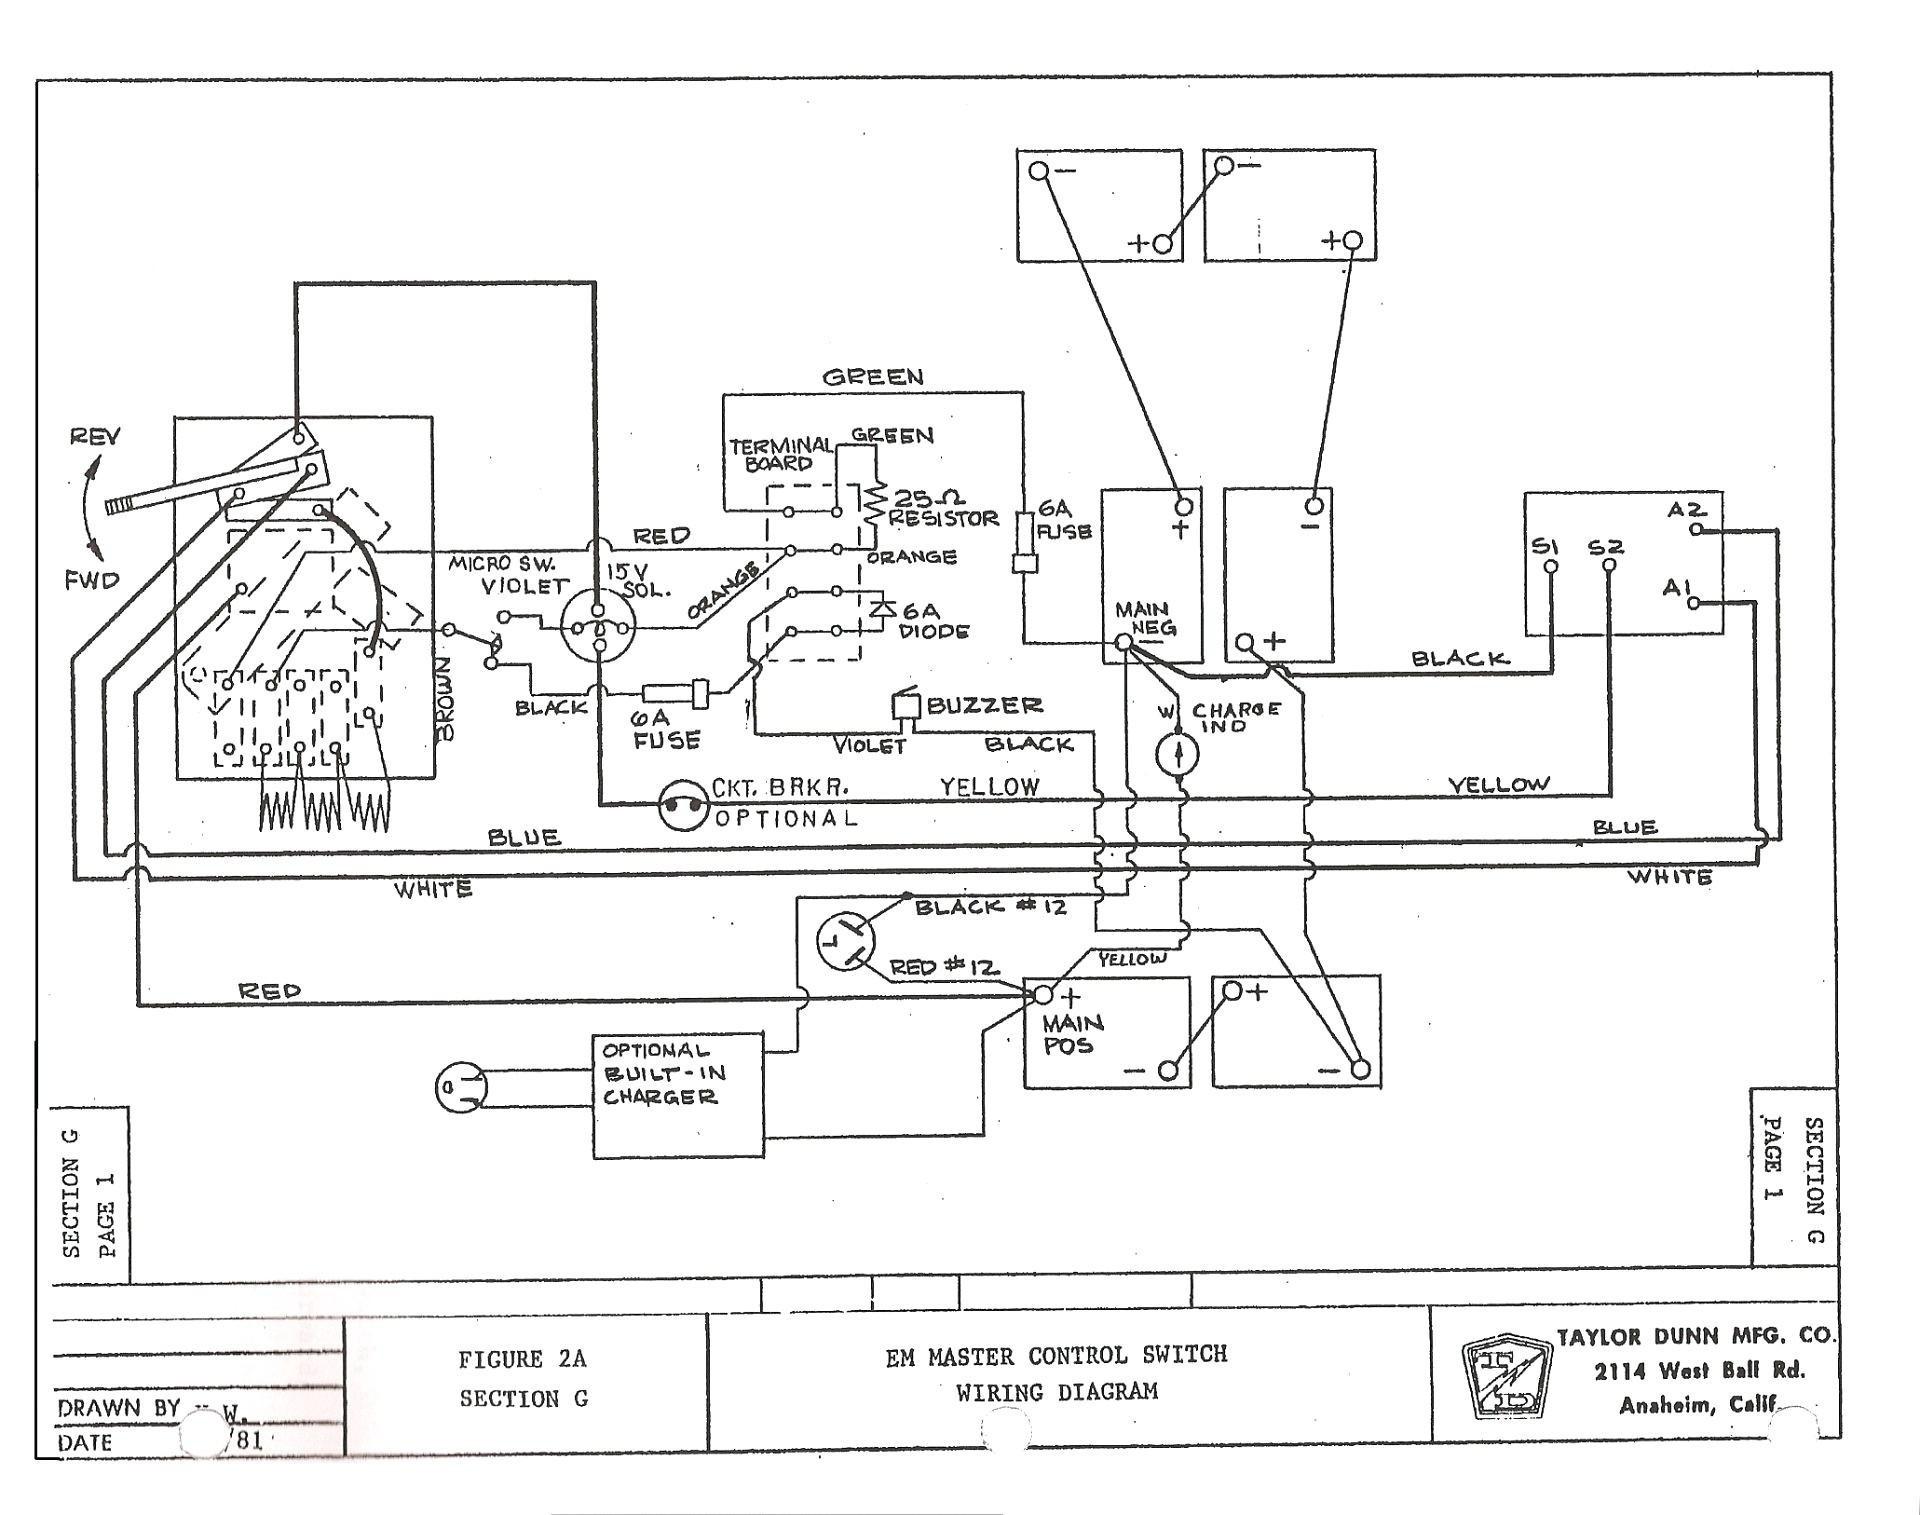 Wiring Diagrams for Yamaha Golf Carts Inspirationa Ez Go Gas Golf Cart Wiring Diagram originalstylophone